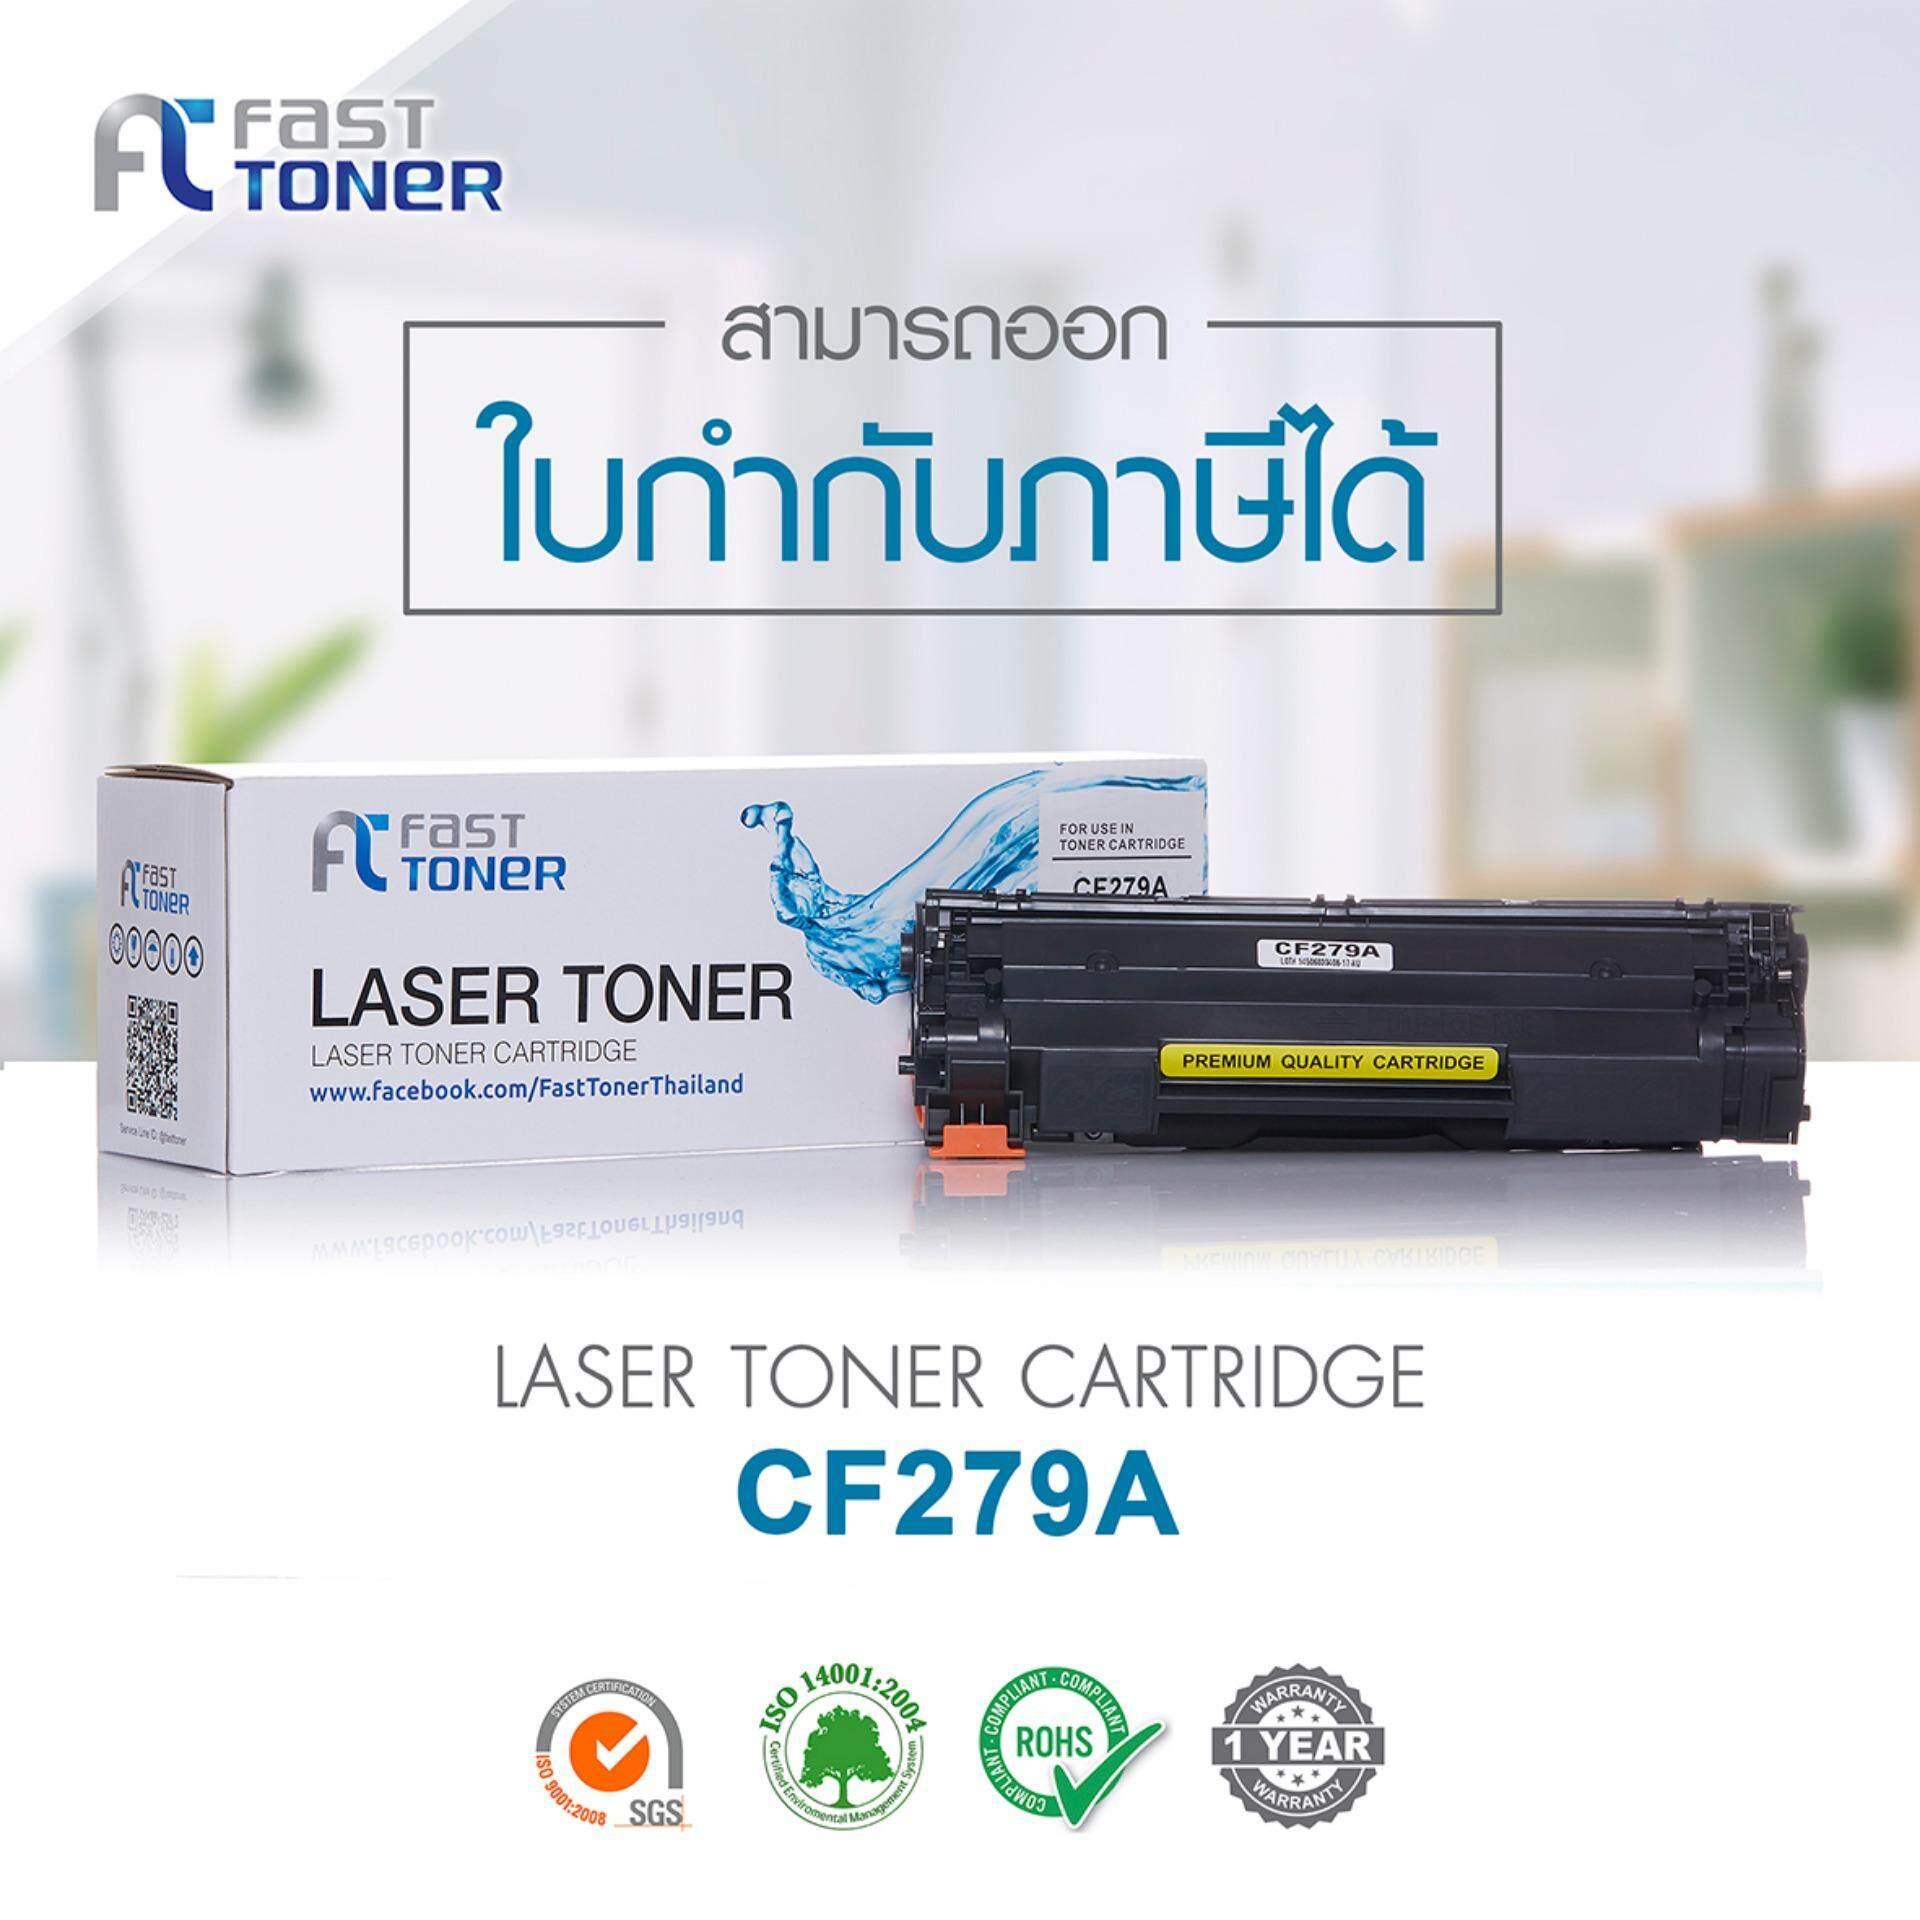 Fast Toner HP CF279A (79A)(สีดำ) สำหรับปริ้นเตอร์รุ่น HP LaserJet Pro M12a/ M12w/ M26a/ M26nw